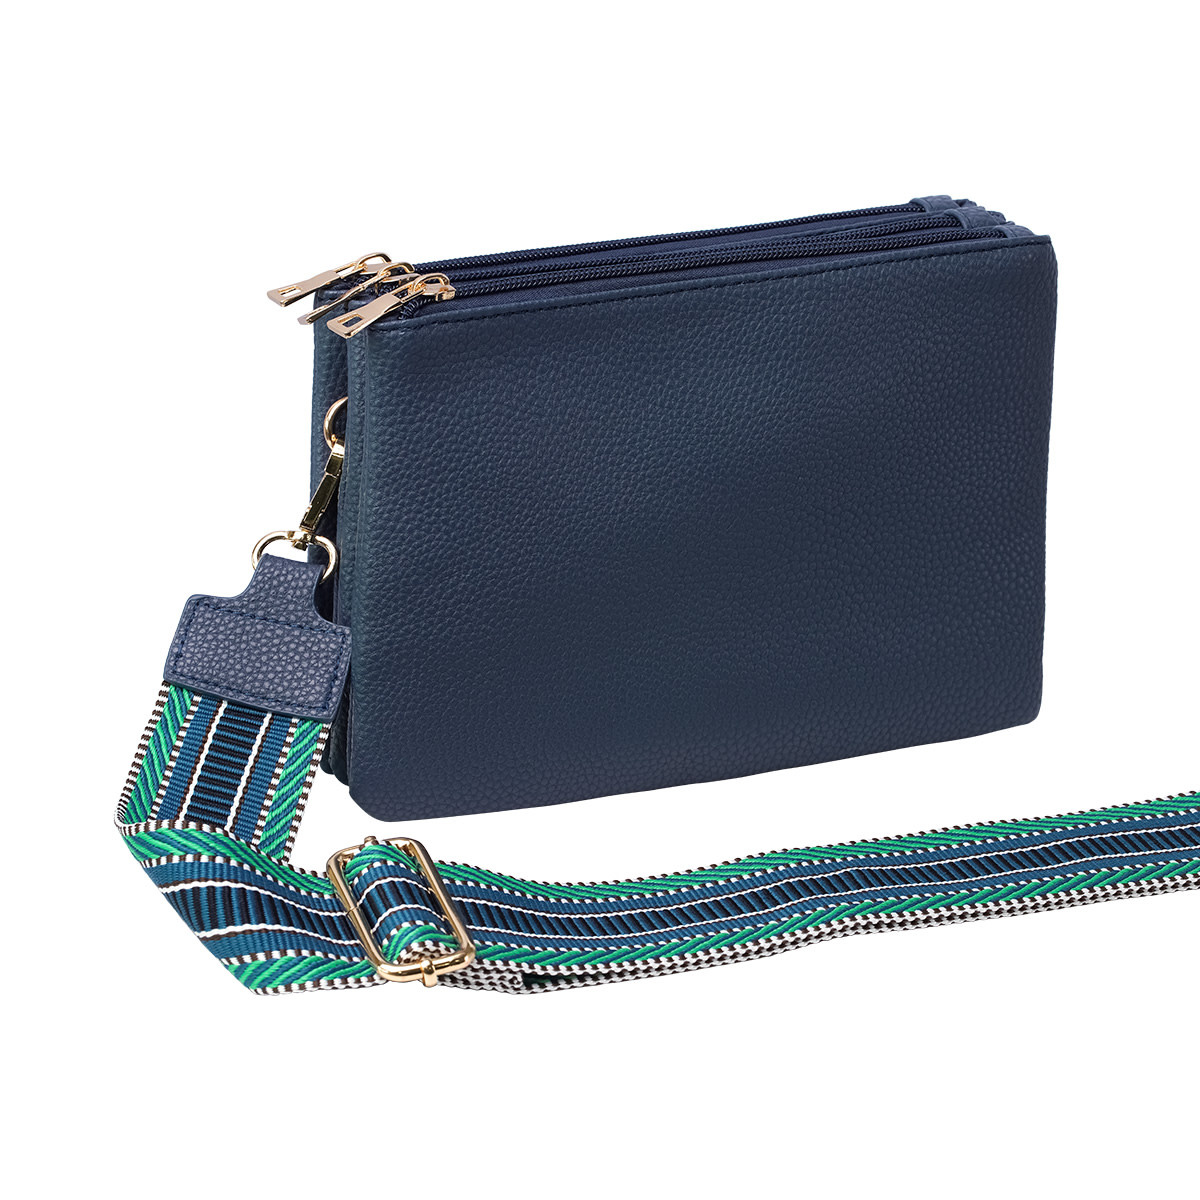 With love Bag 3 compartments - Blue 23cm x 17cm x 5cm